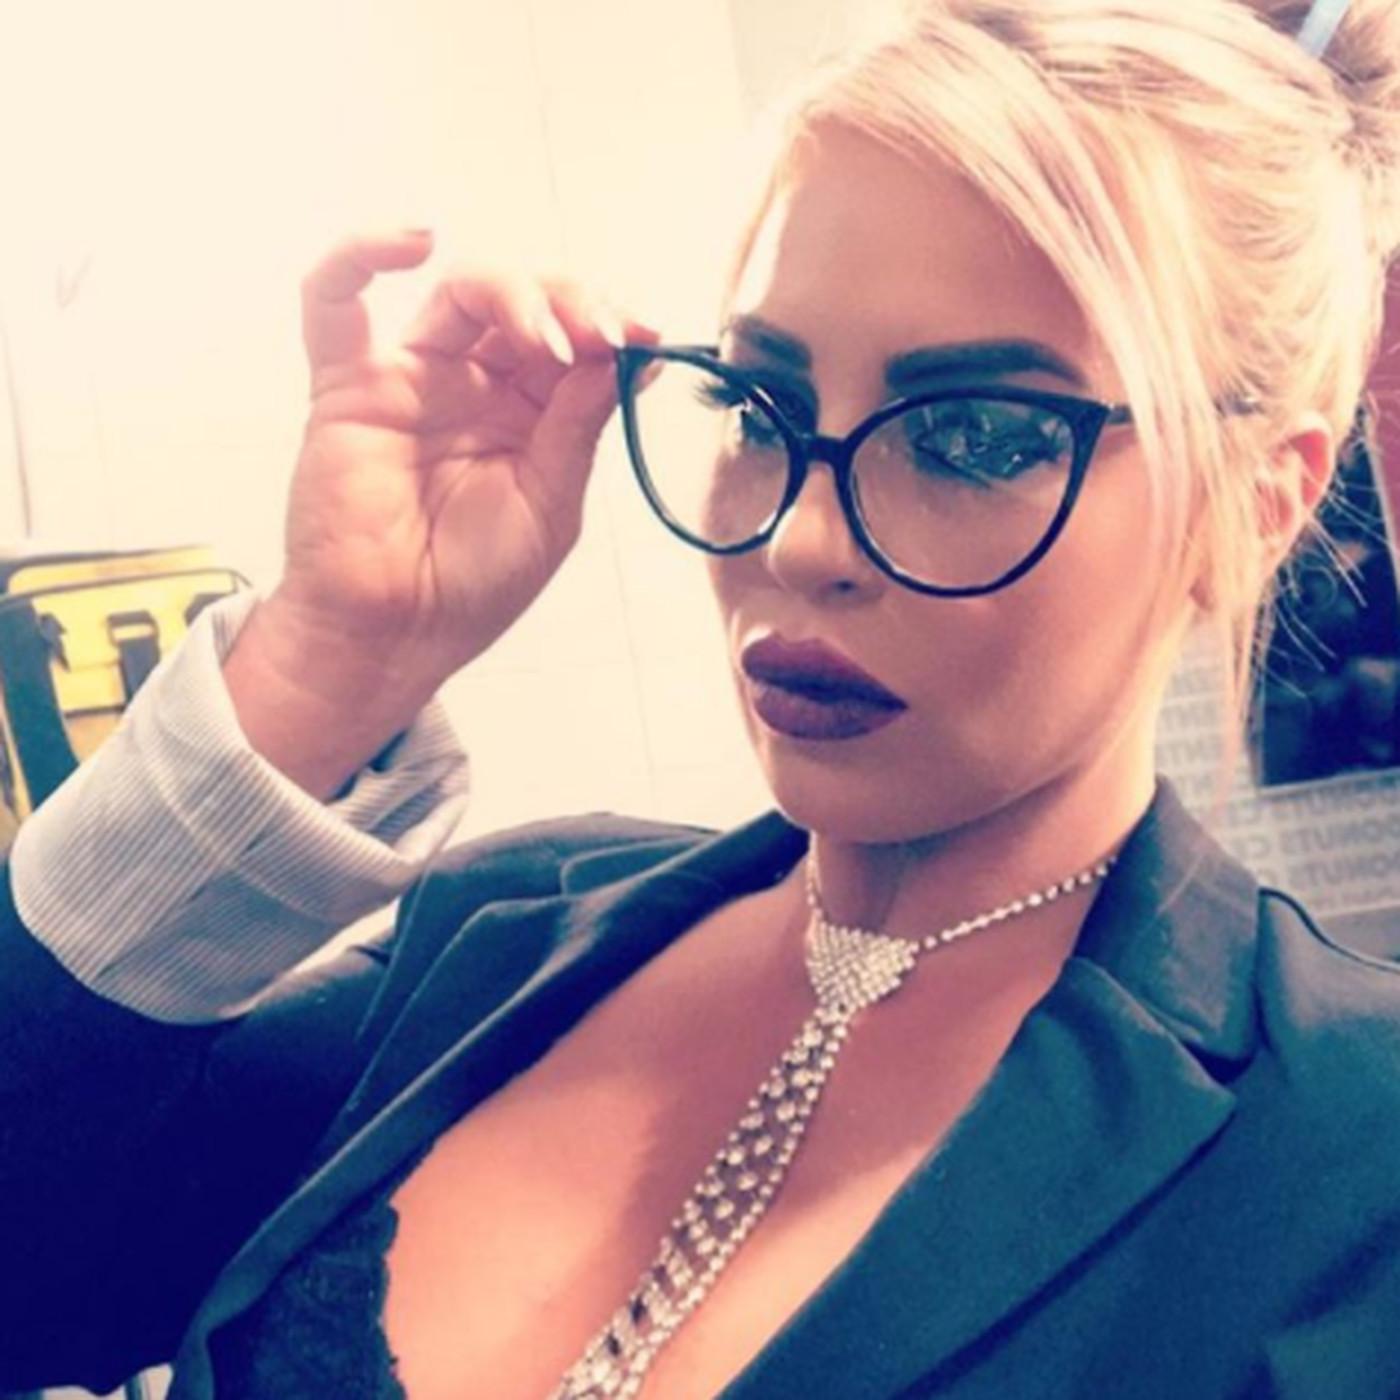 Dana Brooke wants in on the women's Royal Rumble too.